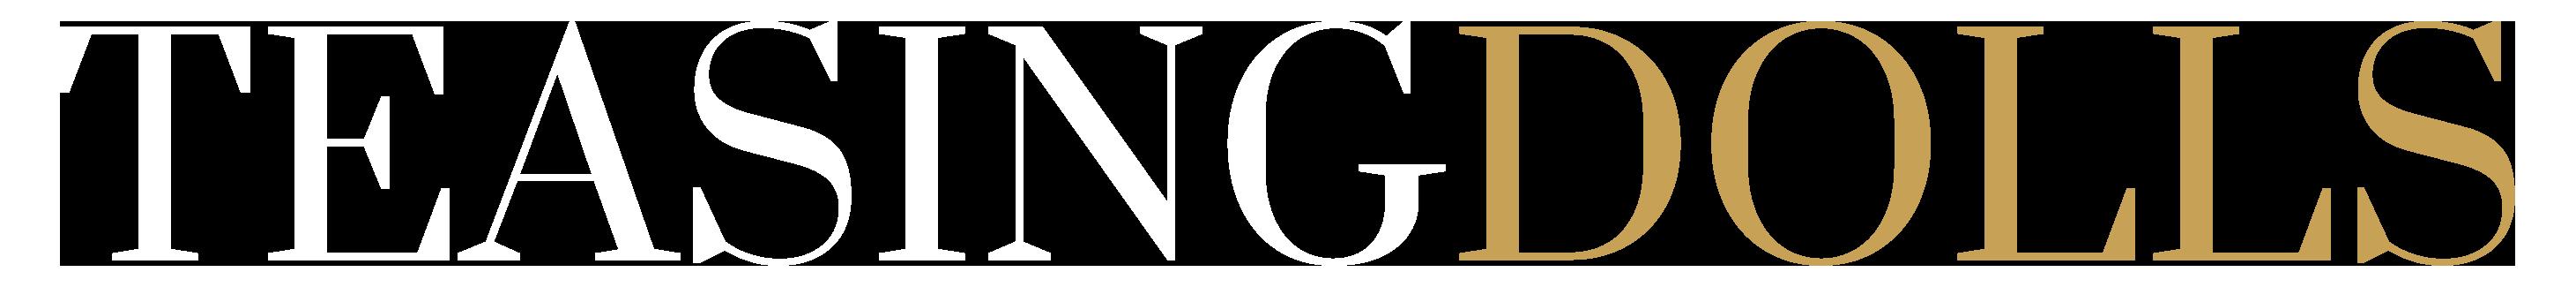 Teasingdolls.com - Erotic Glamour Models logo